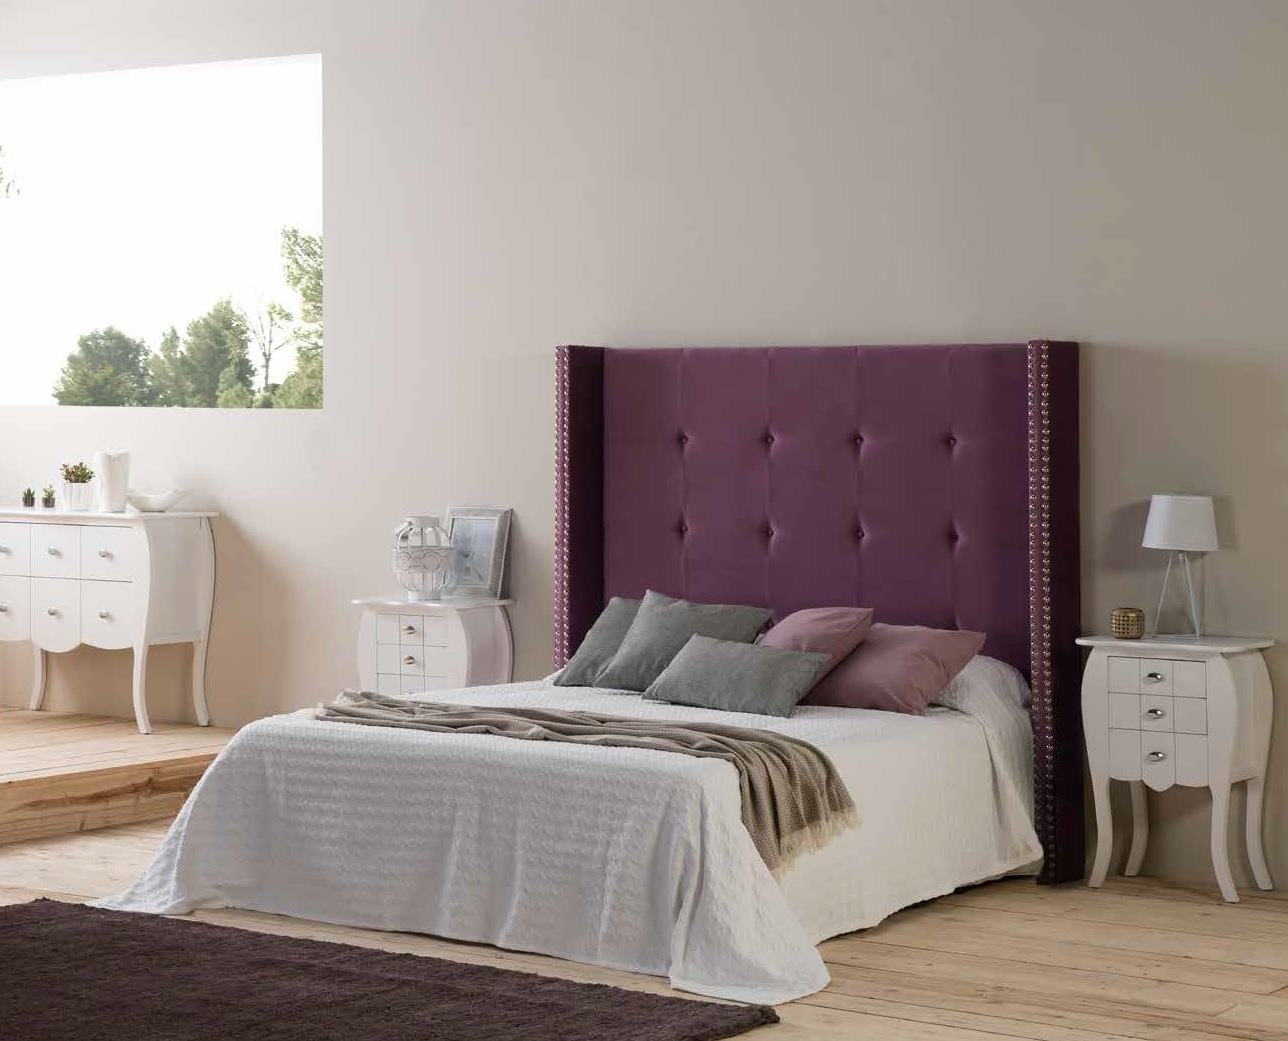 cabeceros-tapizados-general-muebles-paco-caballero-112-5cae257adc871